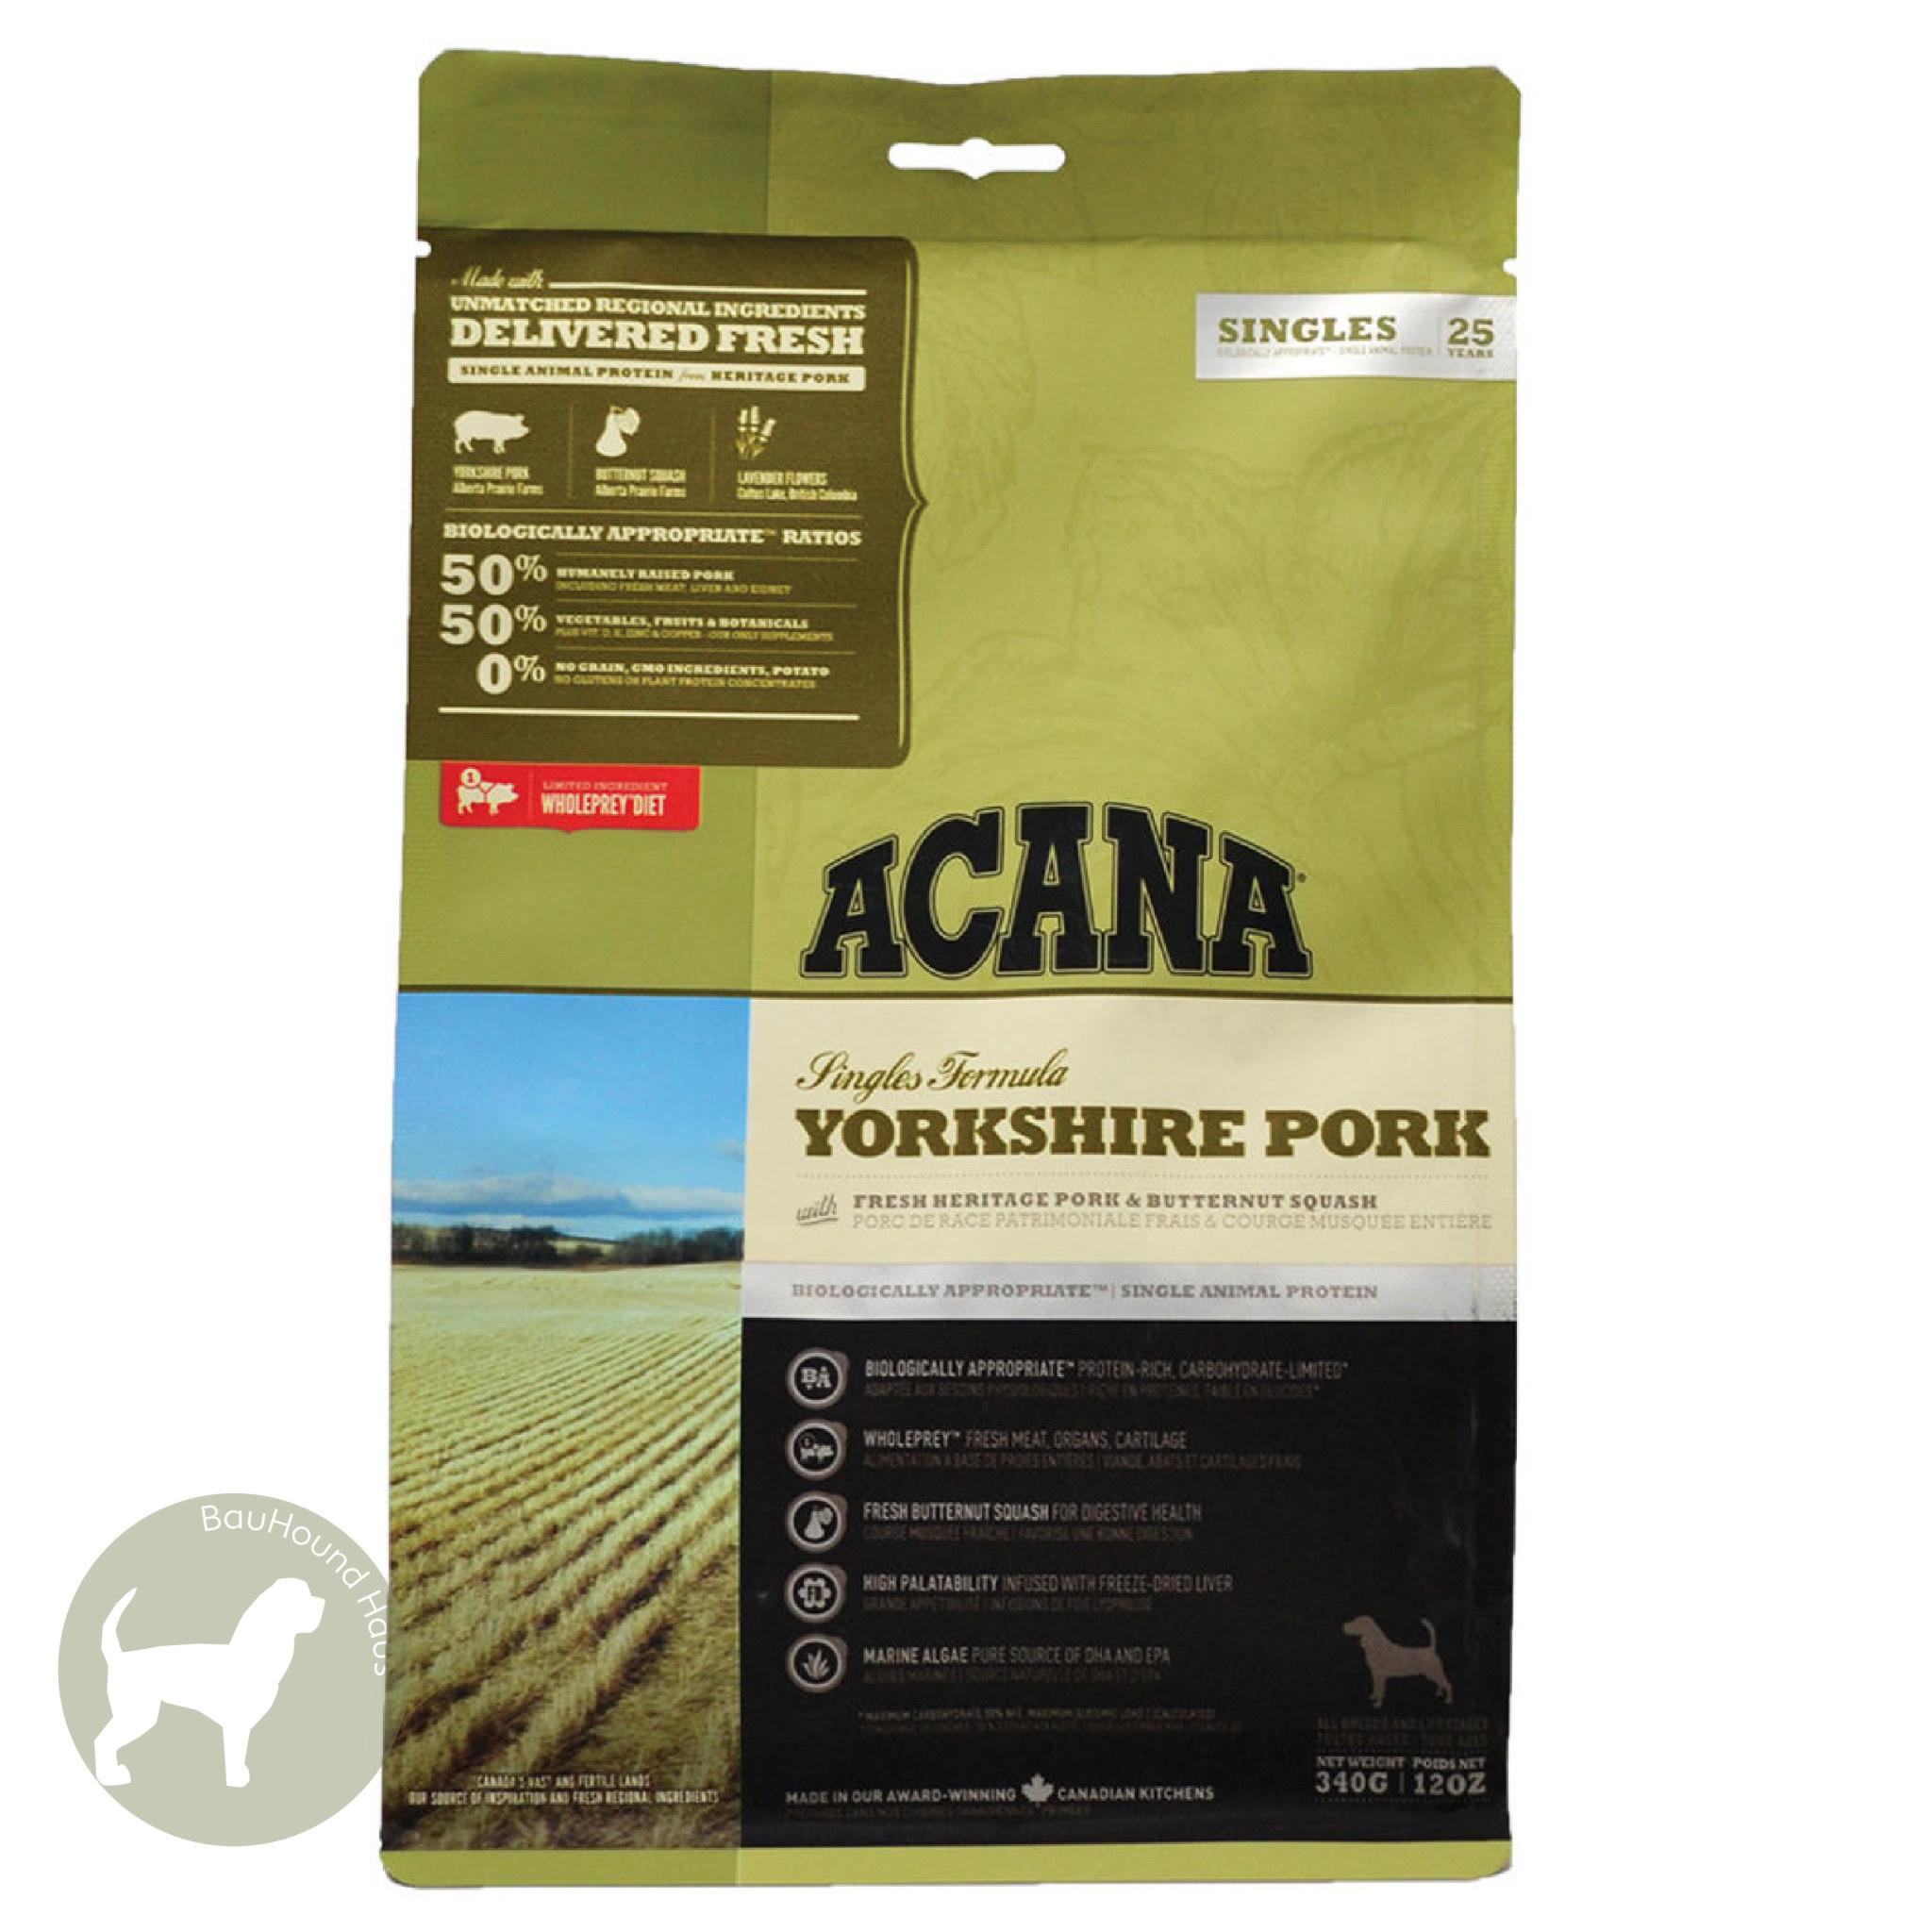 Acana Acana SINGLES Grain-Free Yorkshire Pork Kibble, 11.4 kg